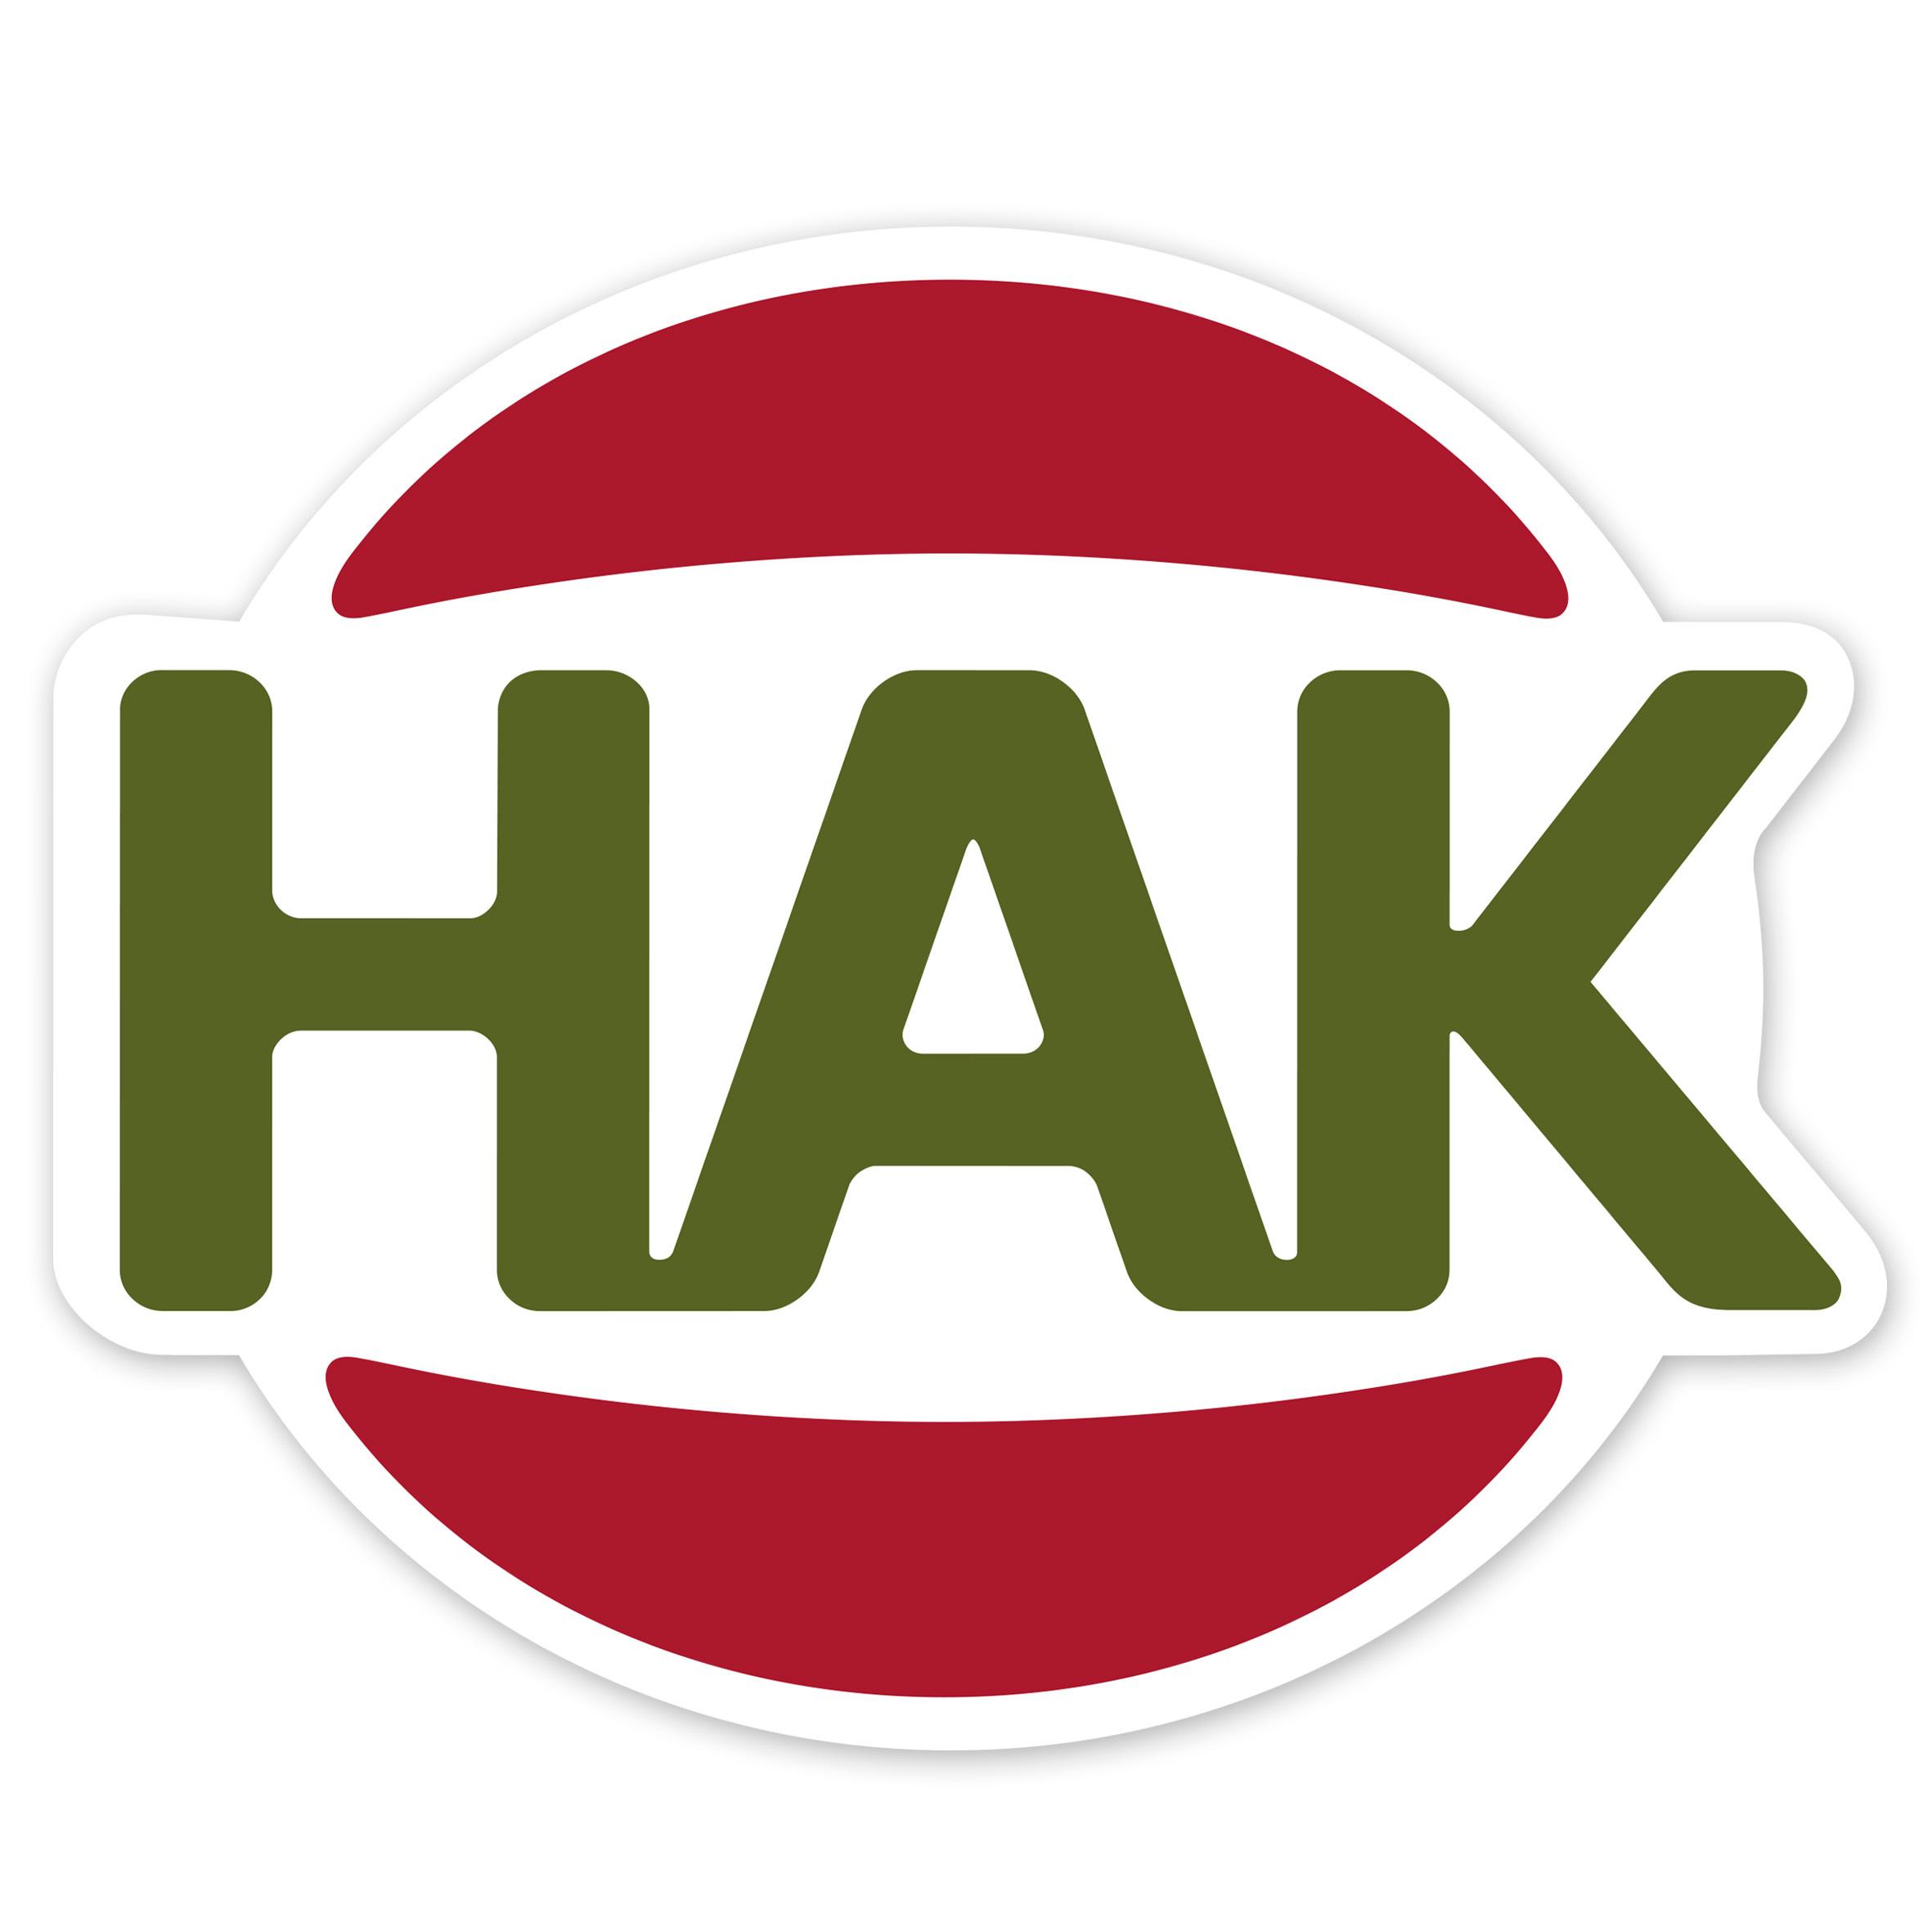 Hak Logo 2016 Digitaal Web Schaduw Rgb